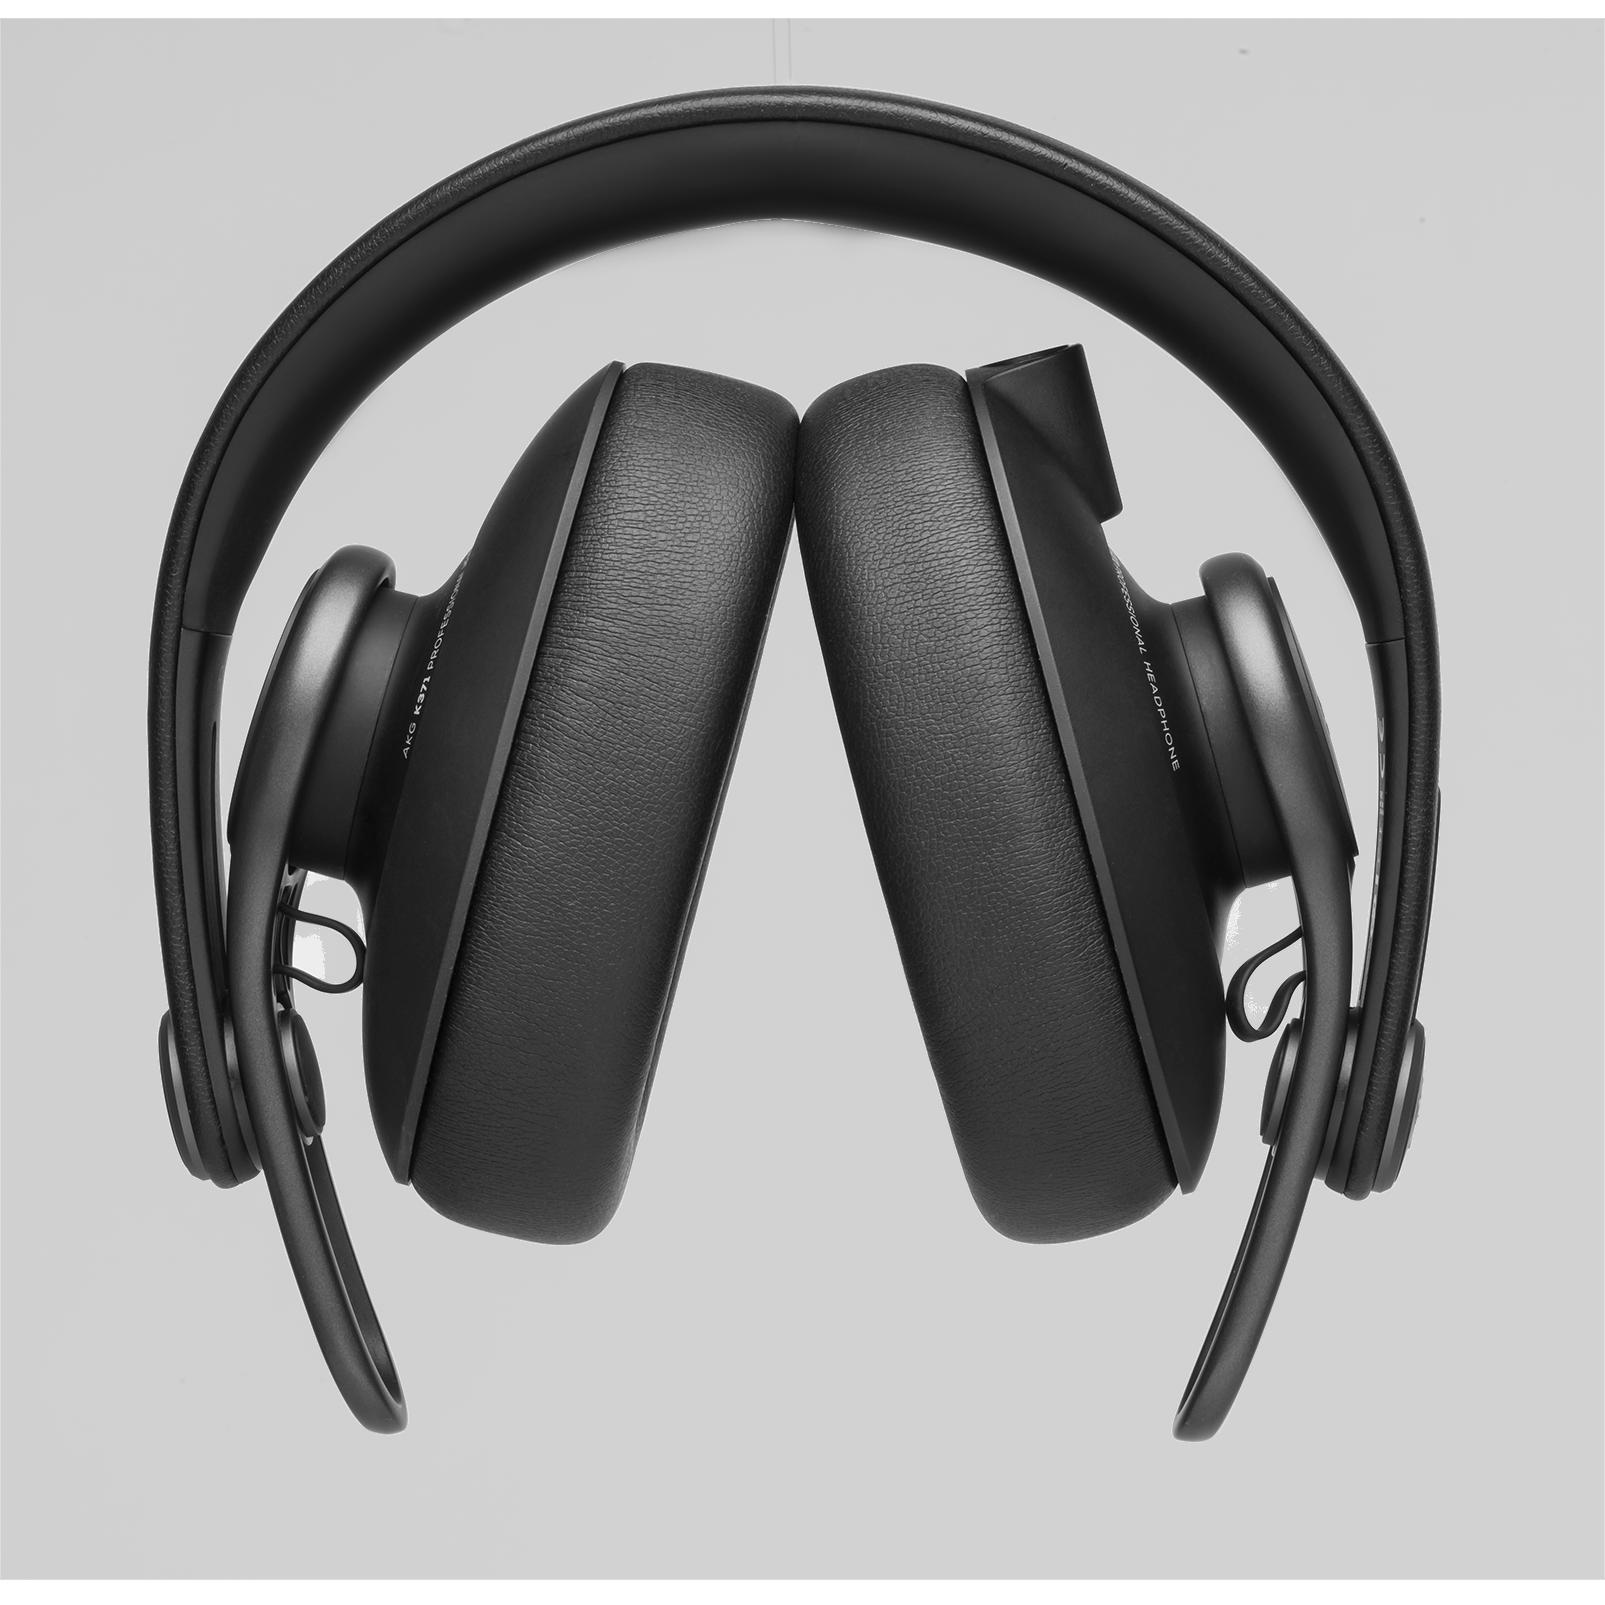 K371 - Black - Over-ear, closed-back, foldable studio headphones  - Detailshot 2